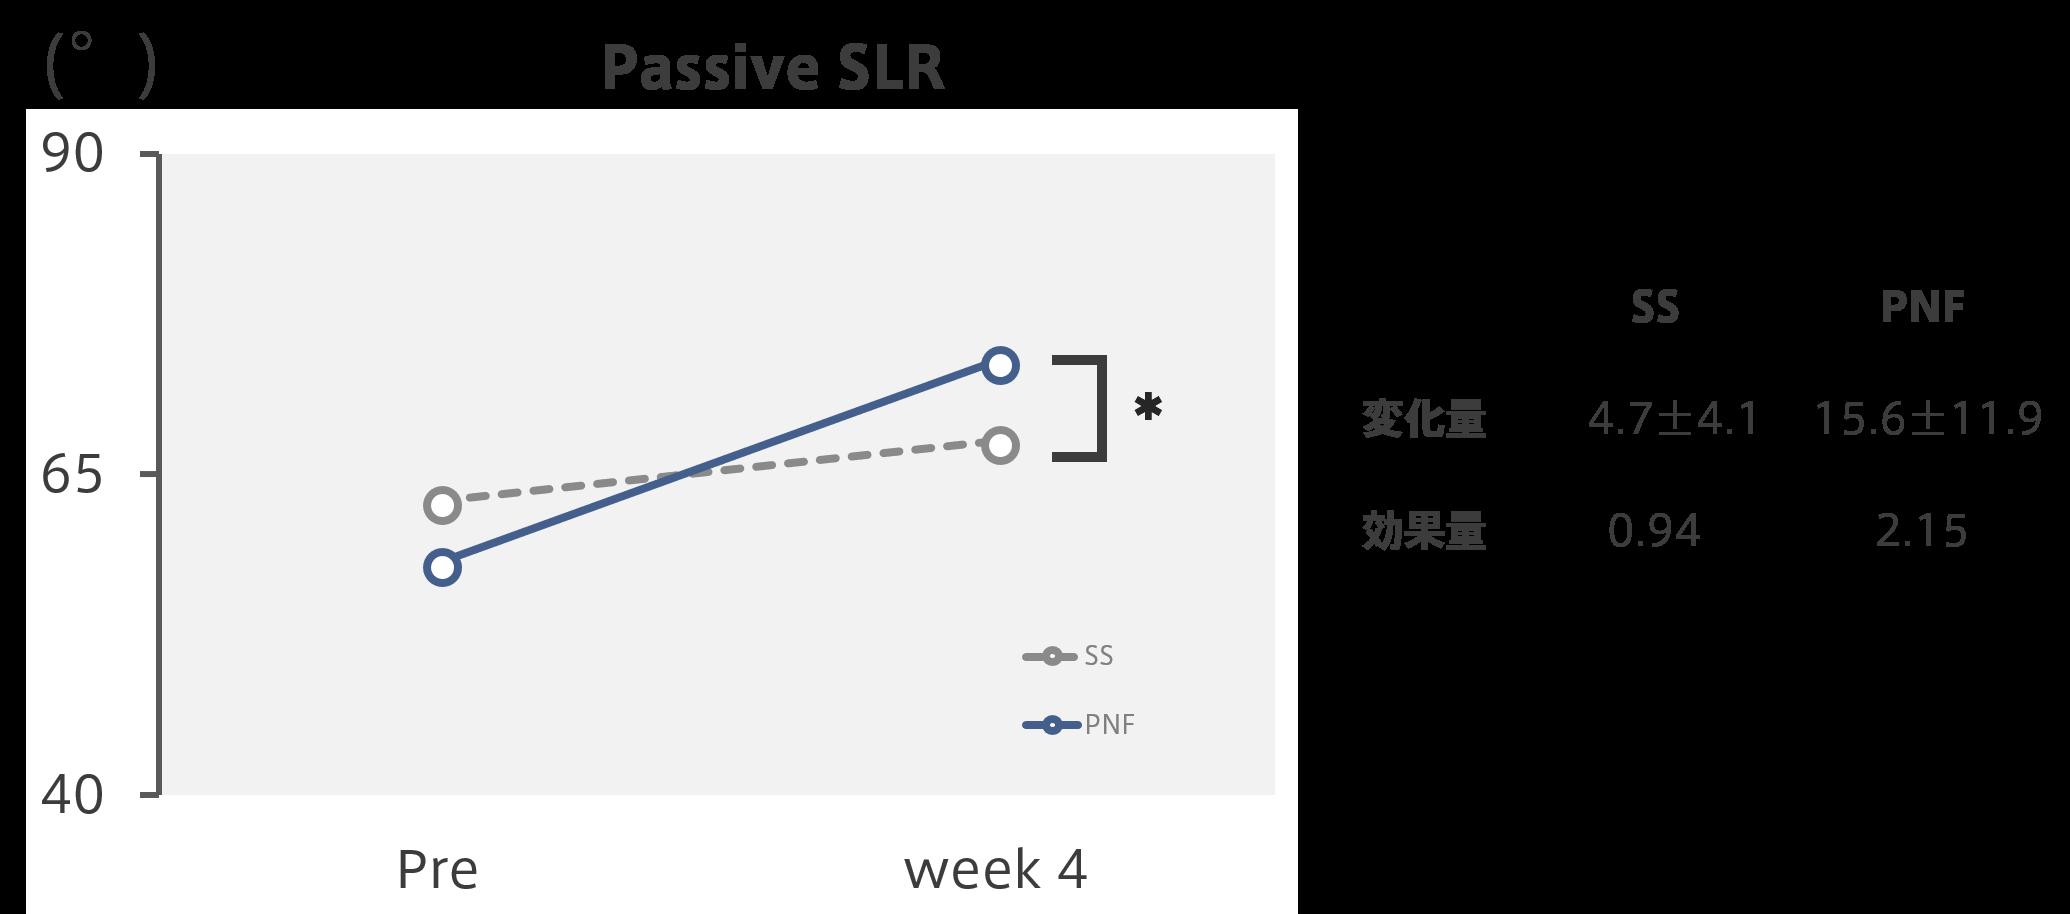 passive SLR-Yildirim2016